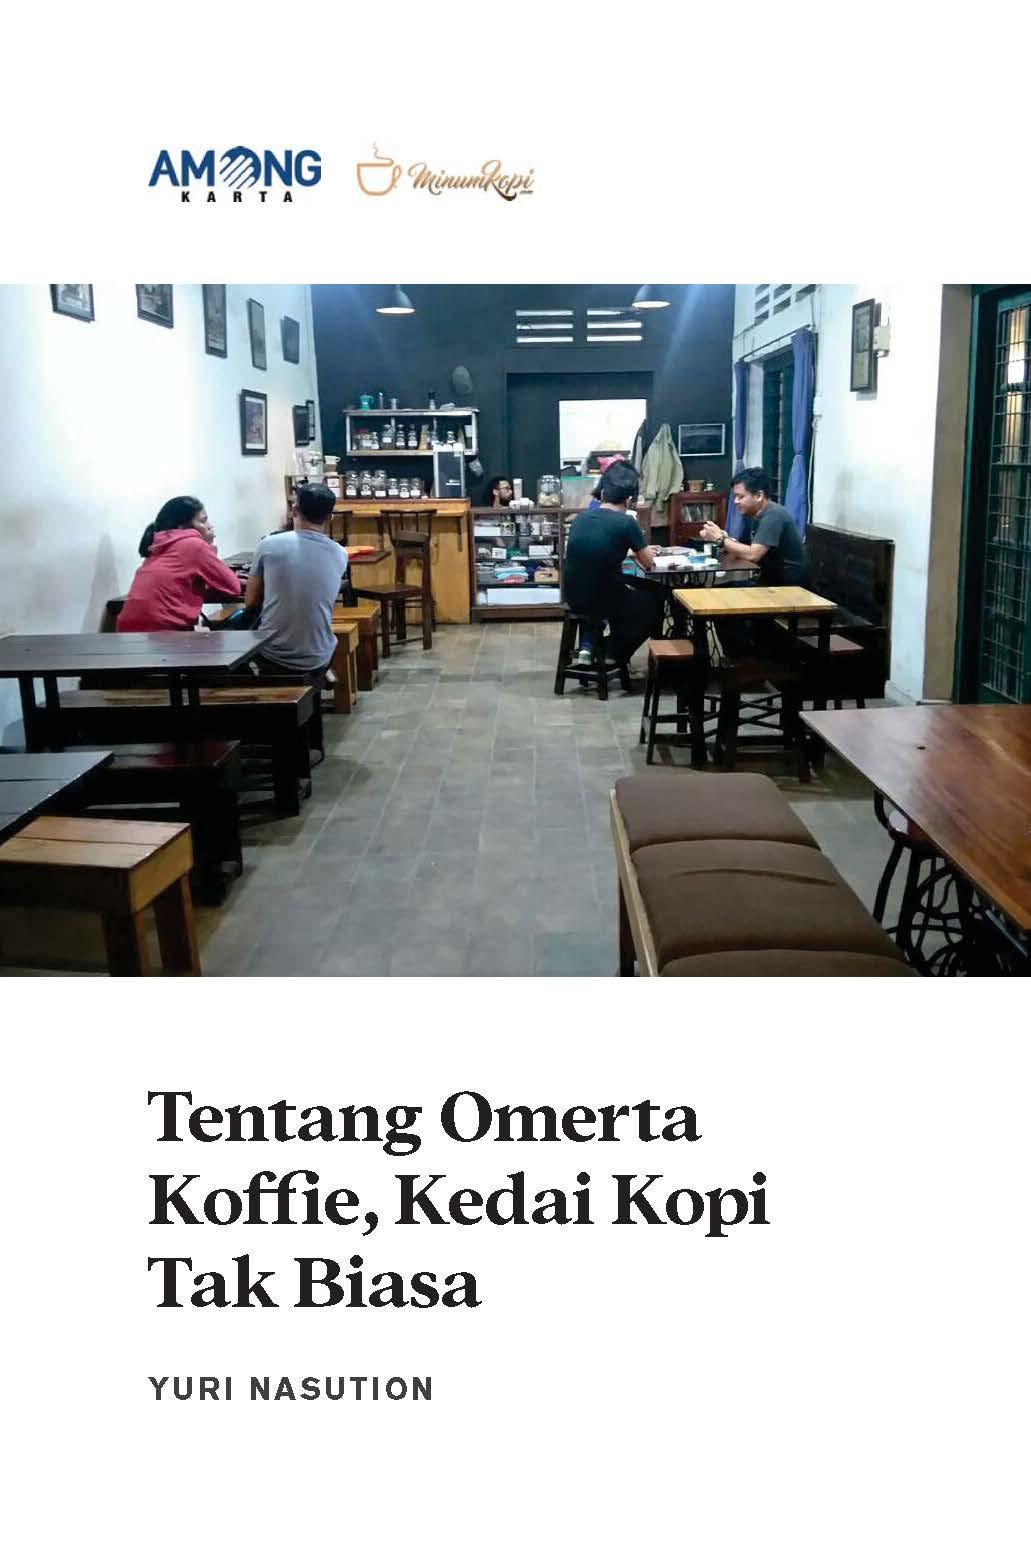 Tentang omerta koffie, kedai kopi tak biasa [sumber elektronis]